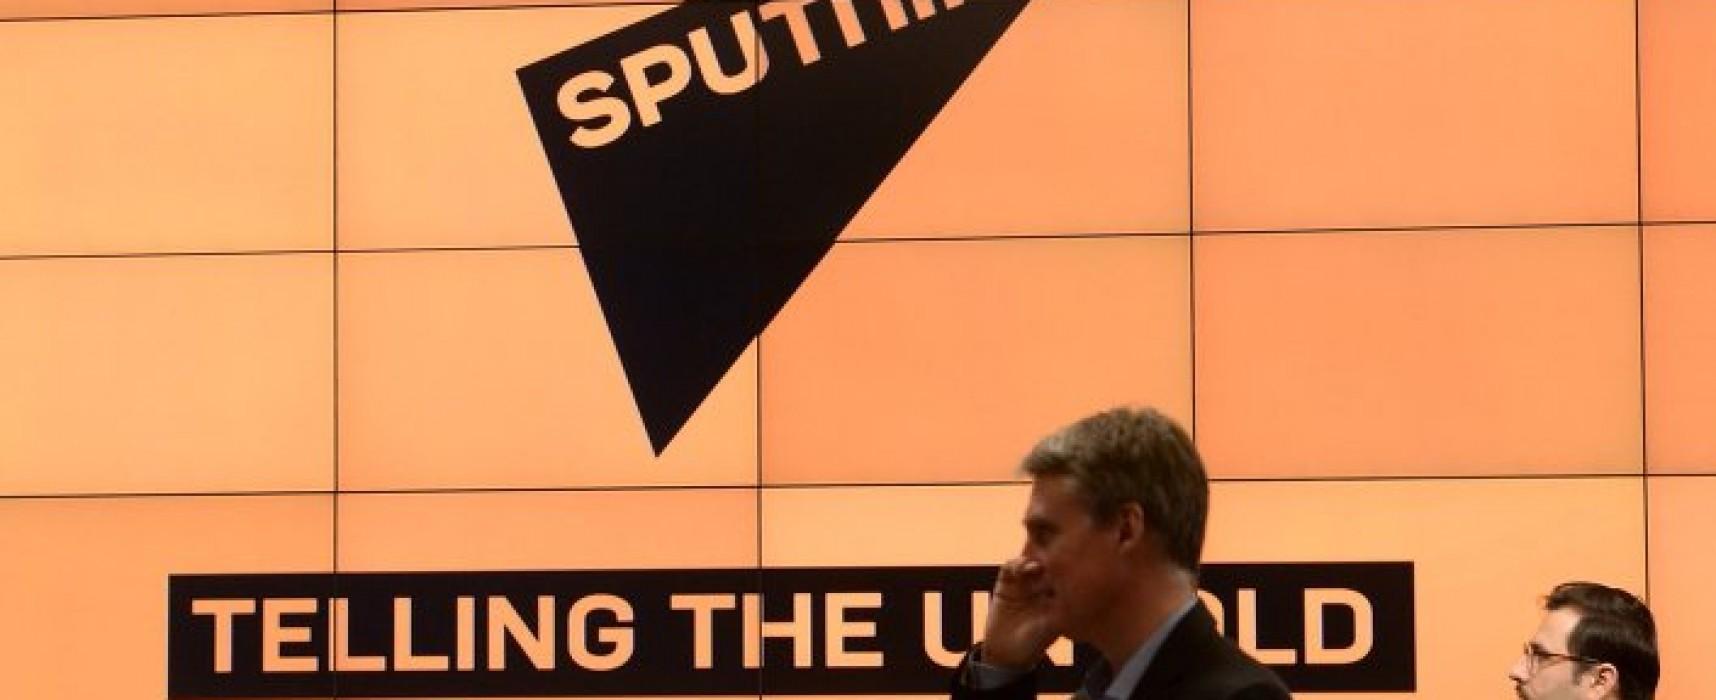 Dmitry Kiselev's Sputnik News Agency Launches Turkish-Language Website, Radio Station